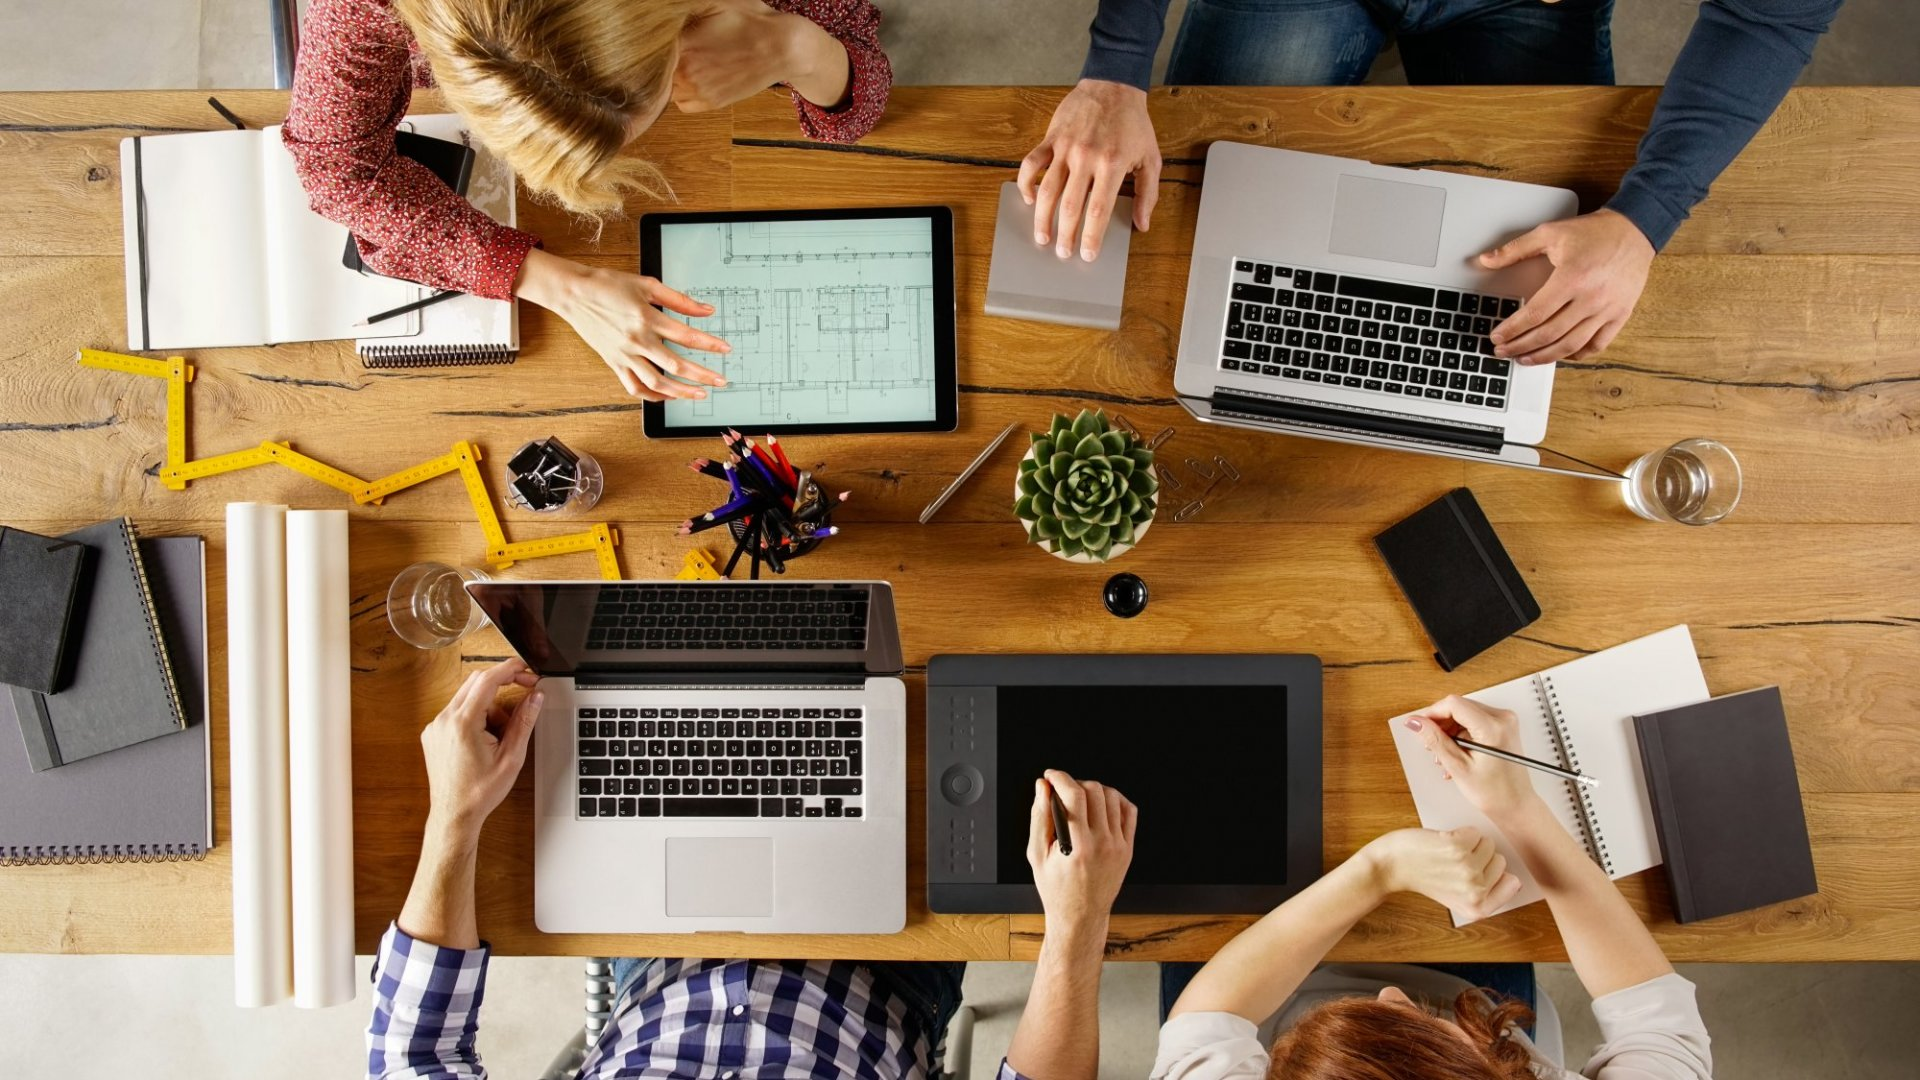 5 Ways to Avoid Hiring an Absolutely Atrocious Freelancer